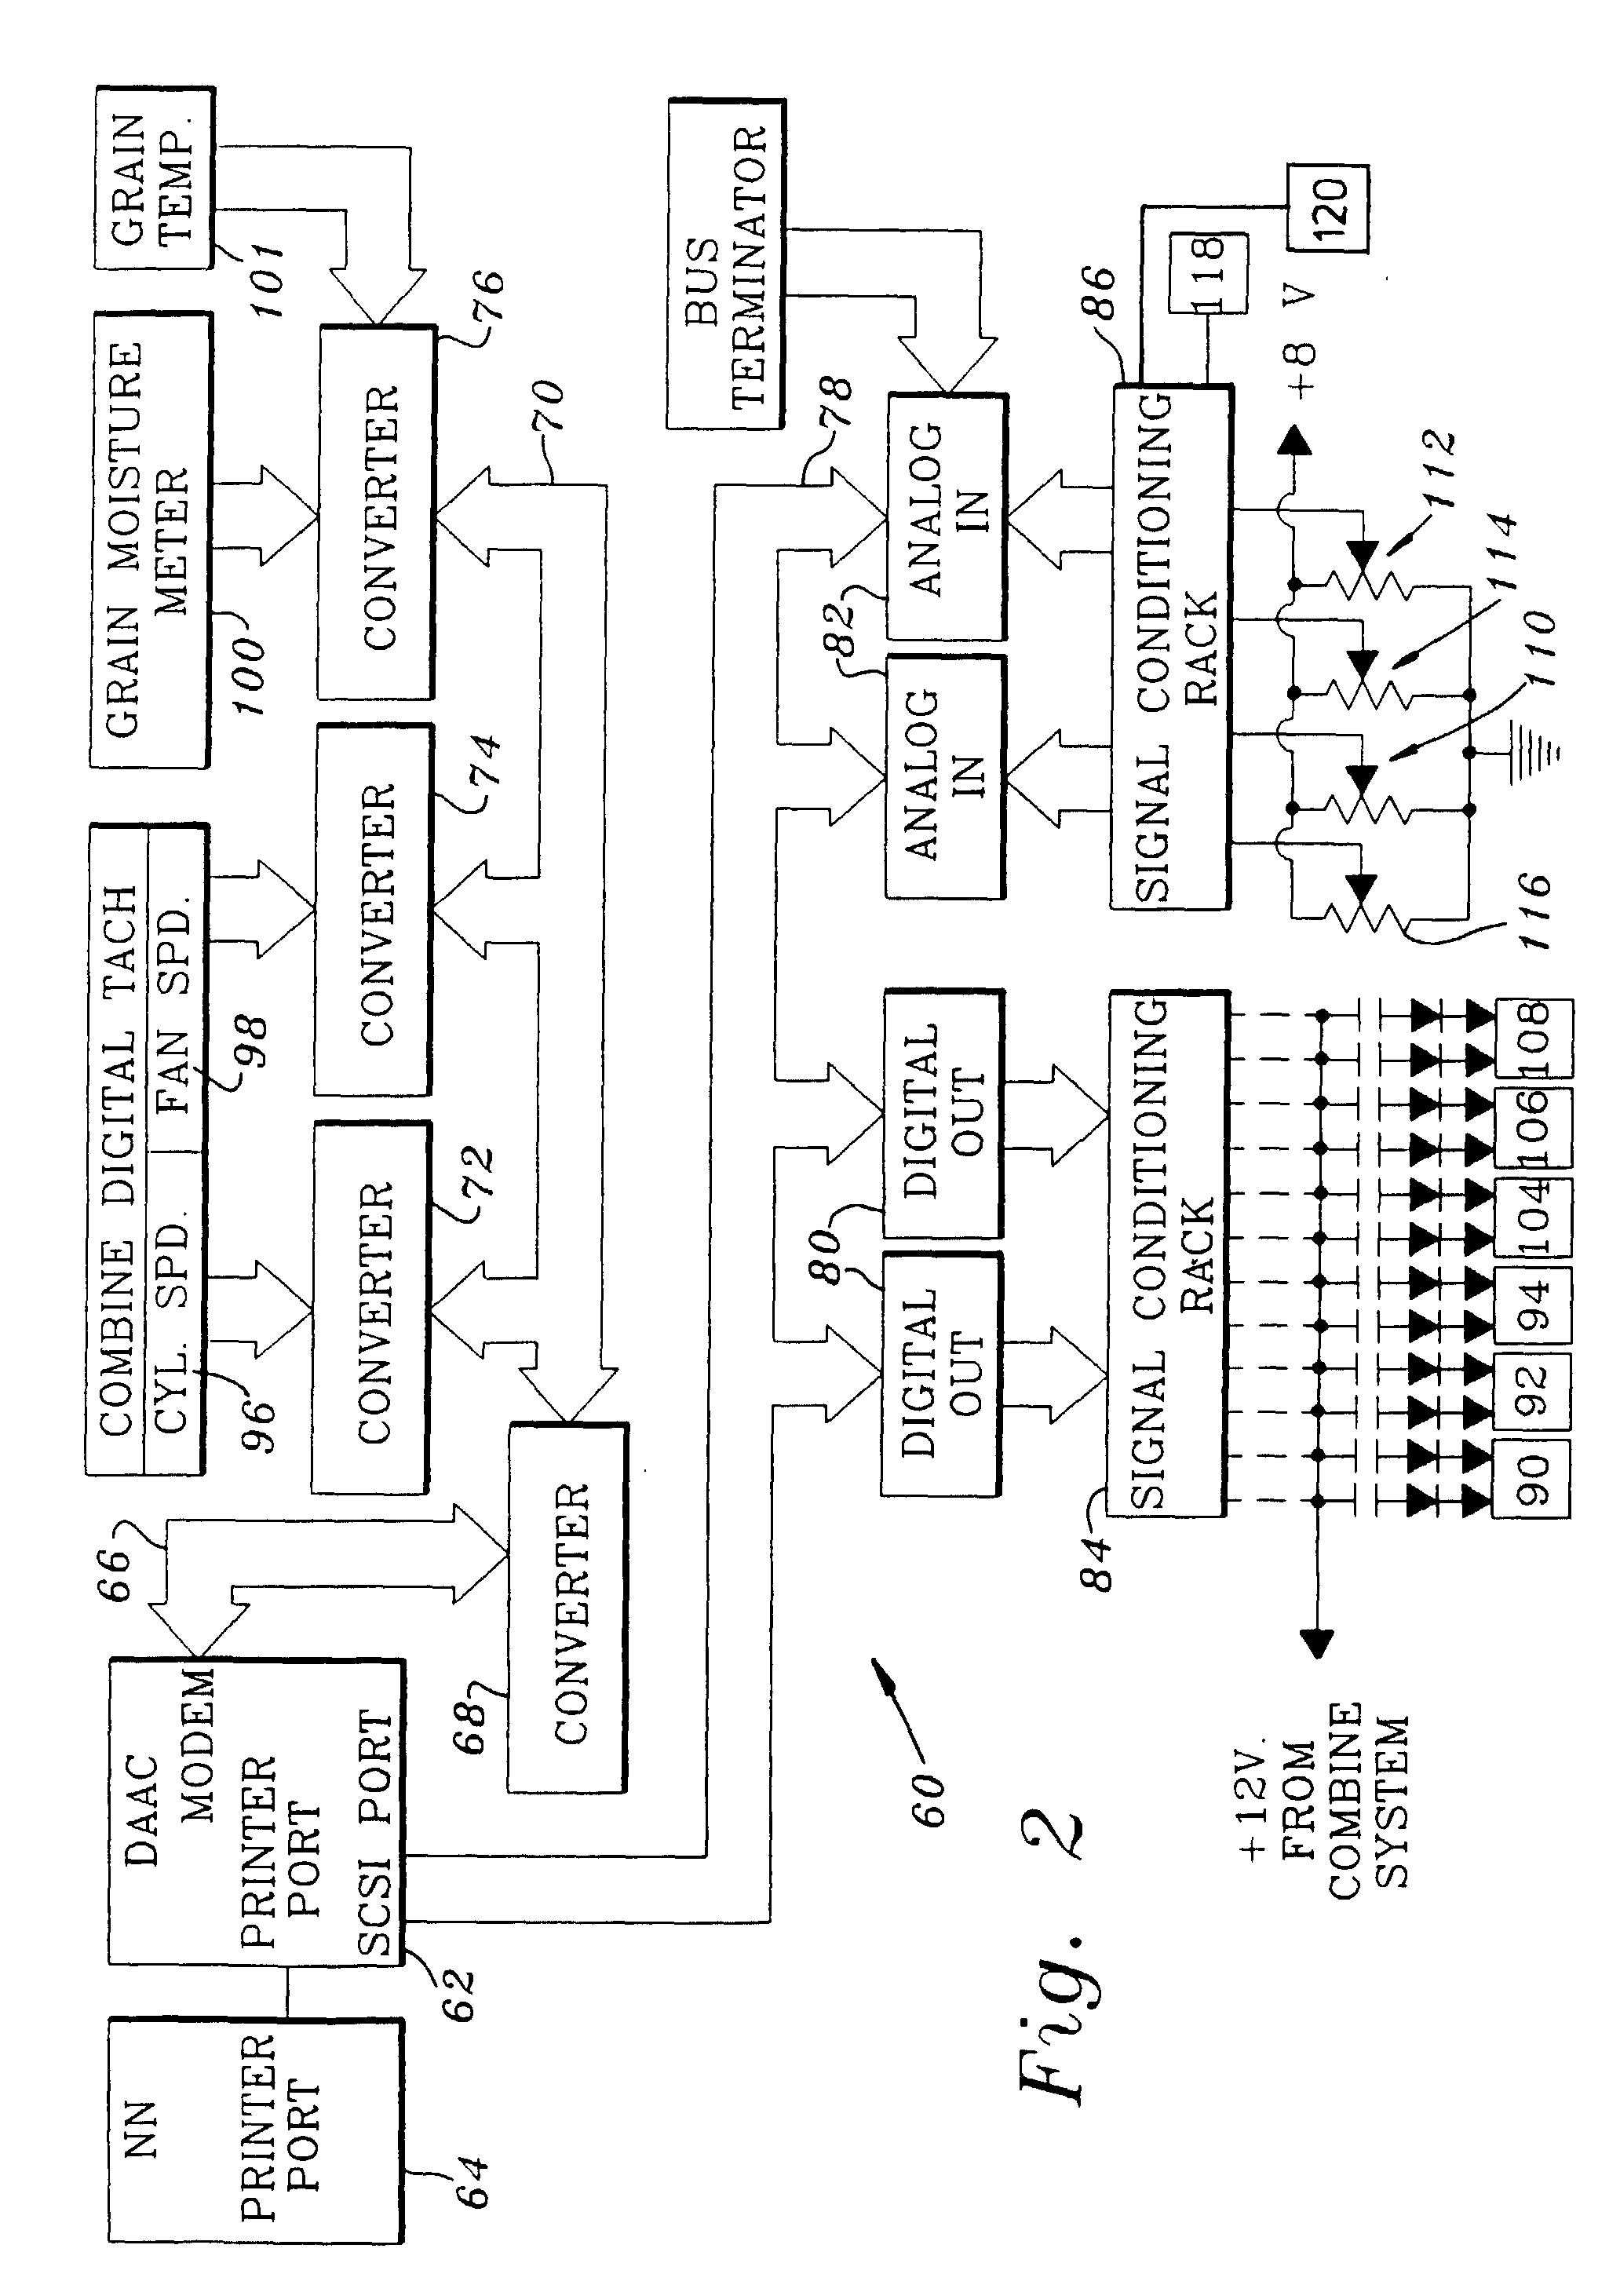 john deere 5420 wiring diagram